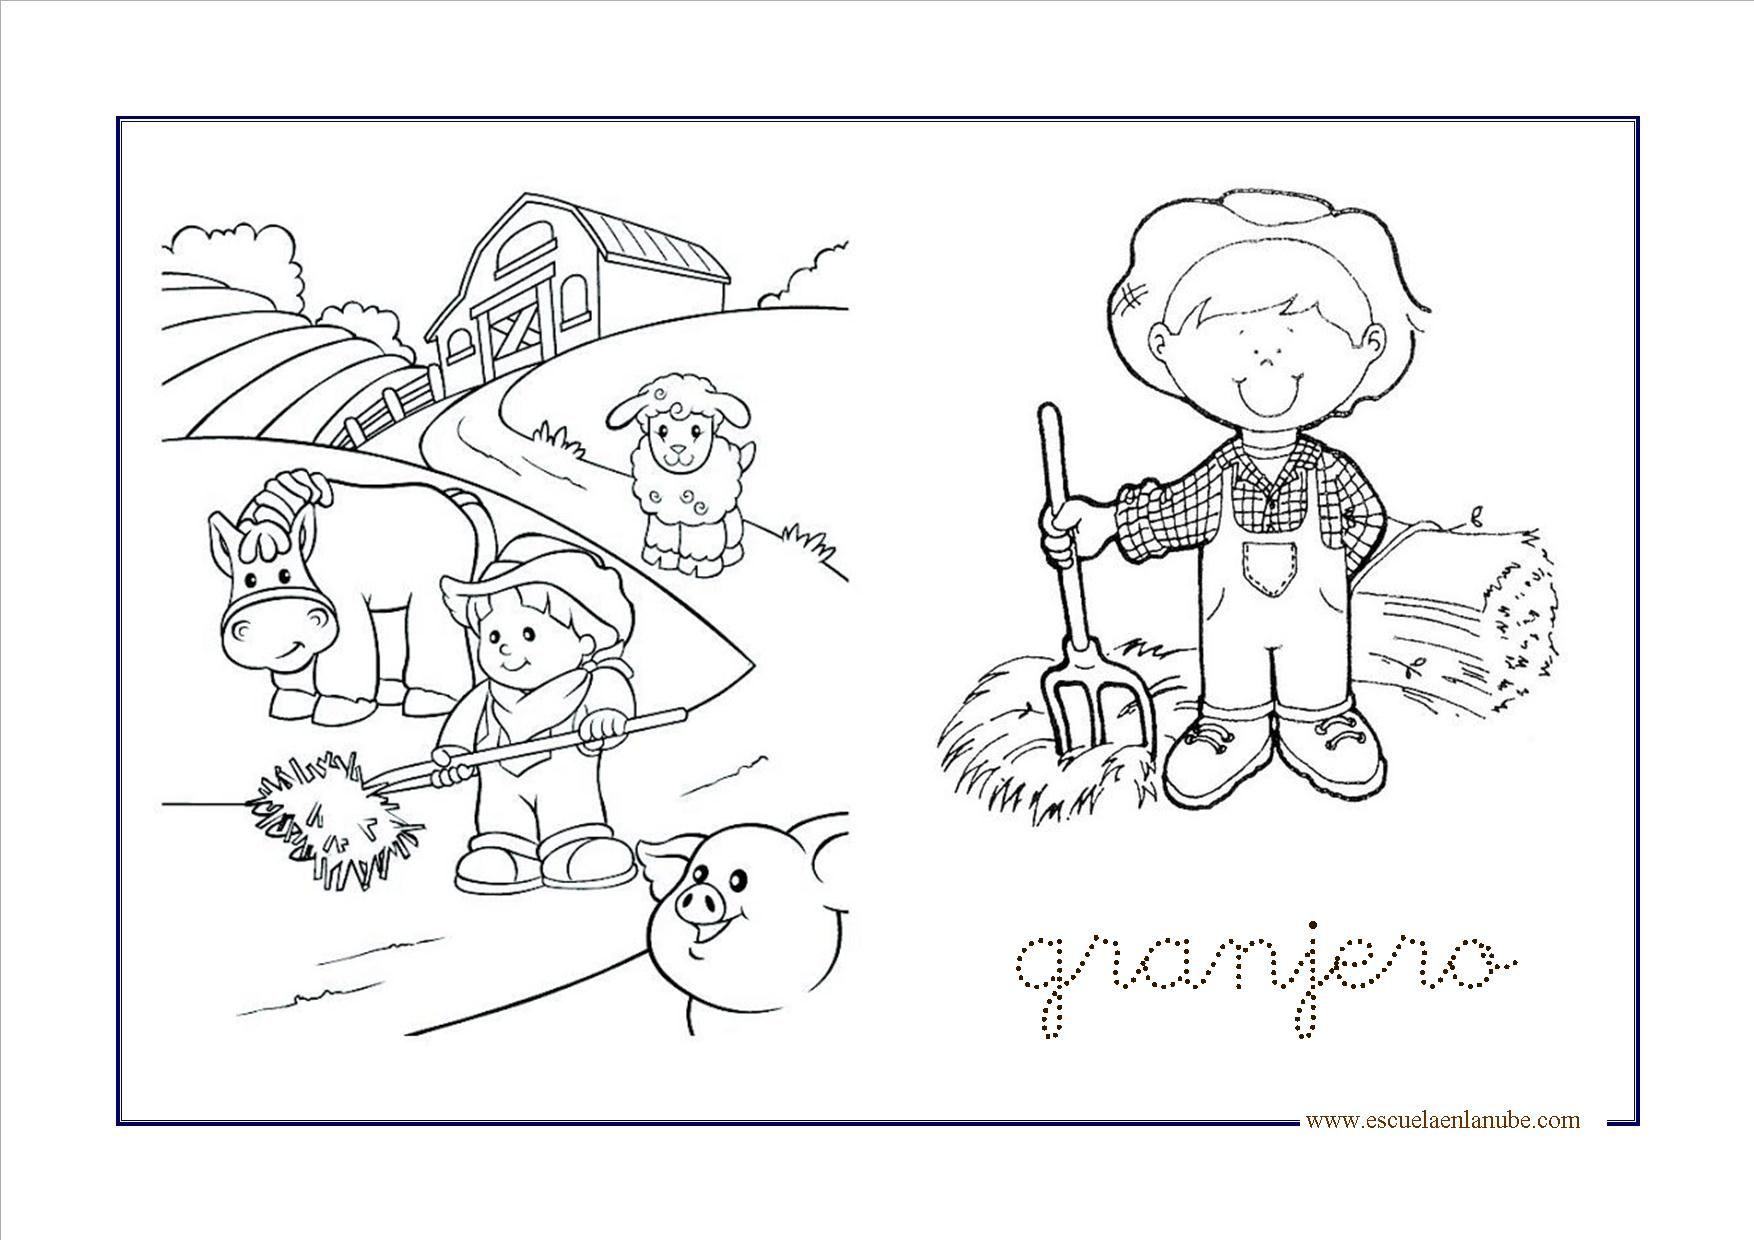 granja1 300x212 | DRAWING | Pinterest | Animales de la granja, La ...